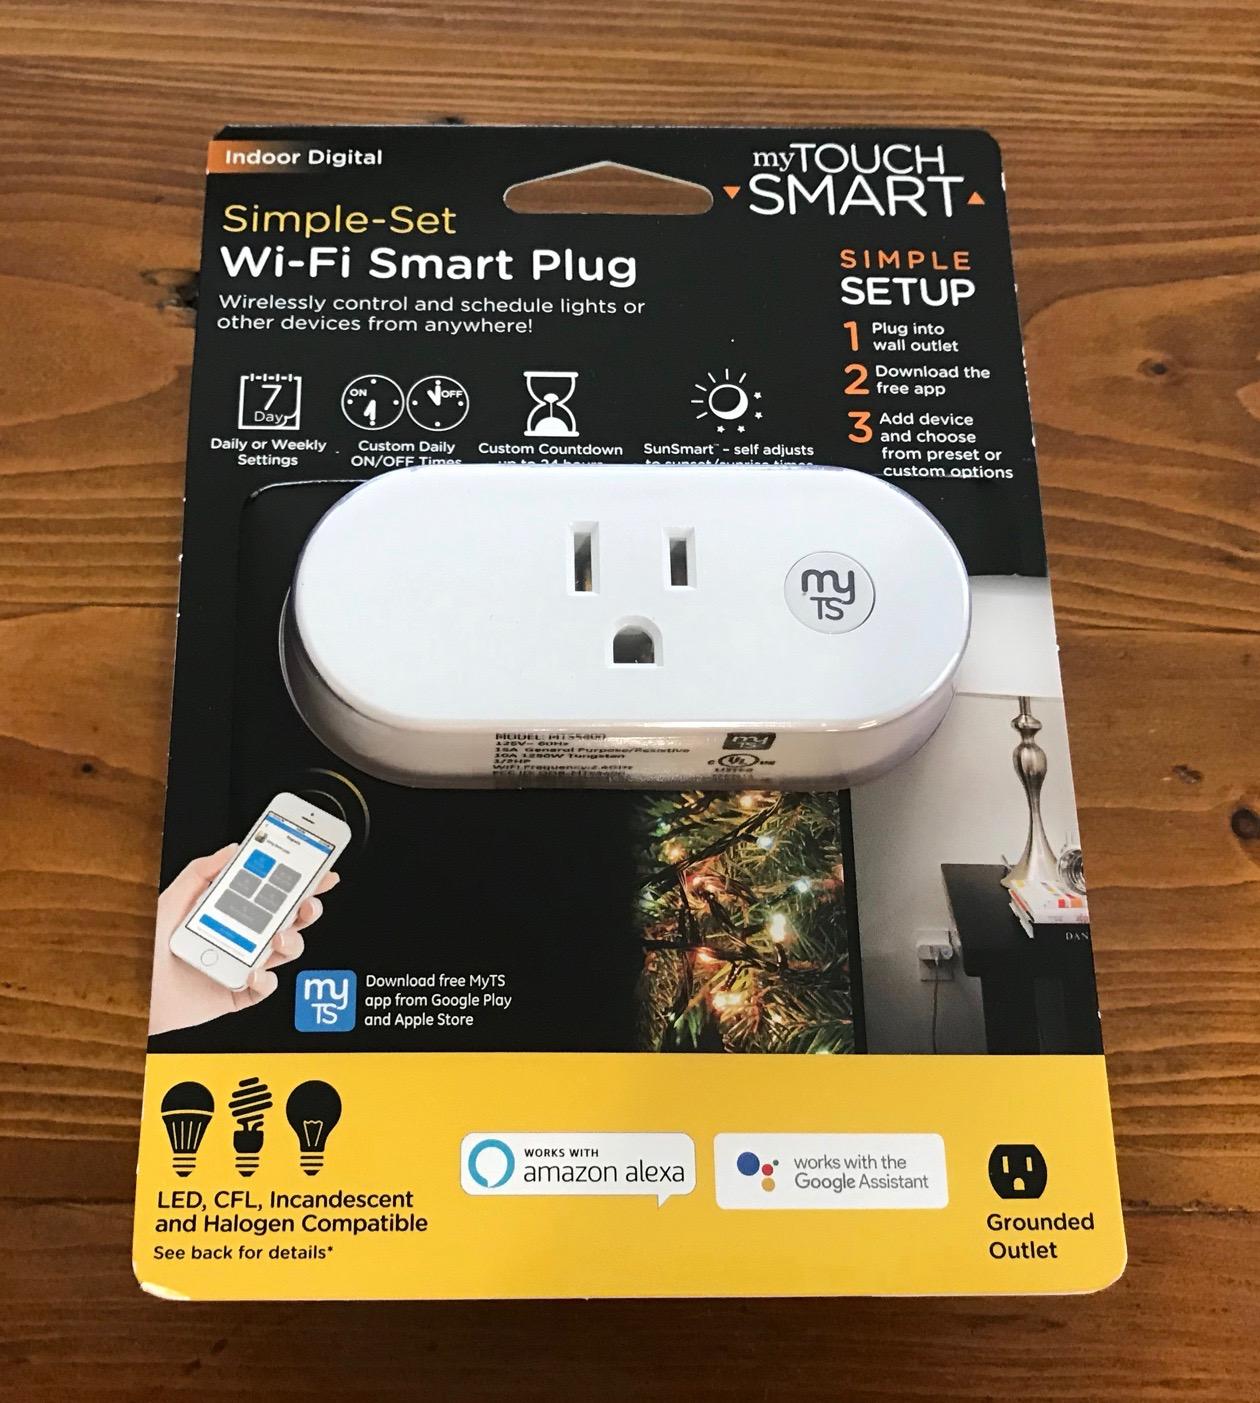 mytouchsmart indoor Wi-Fi Smart Plug